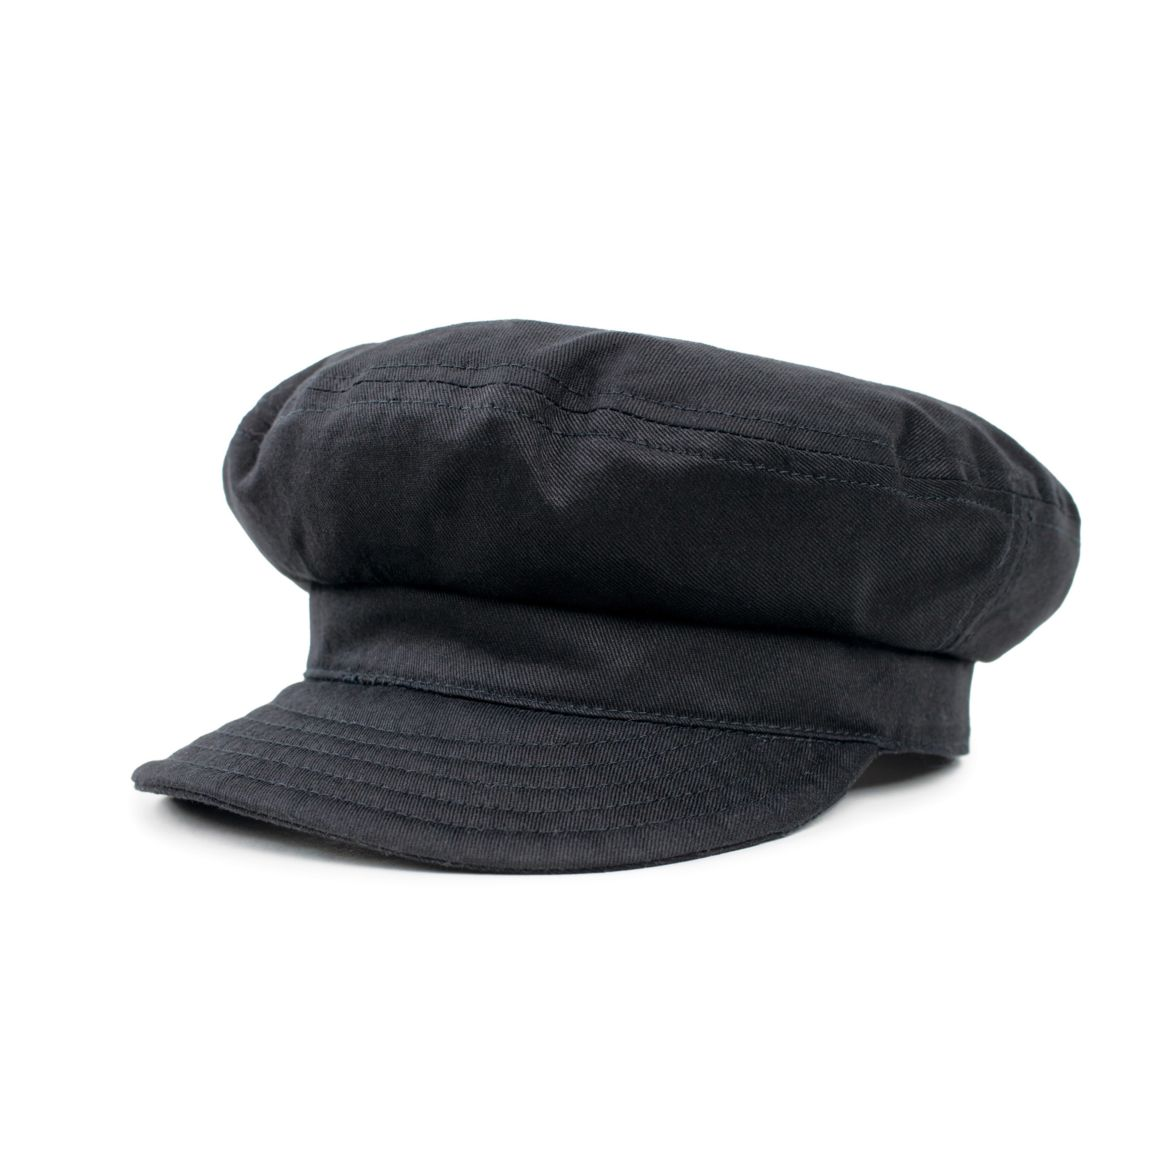 Brixton Fiddler UN Cap Black